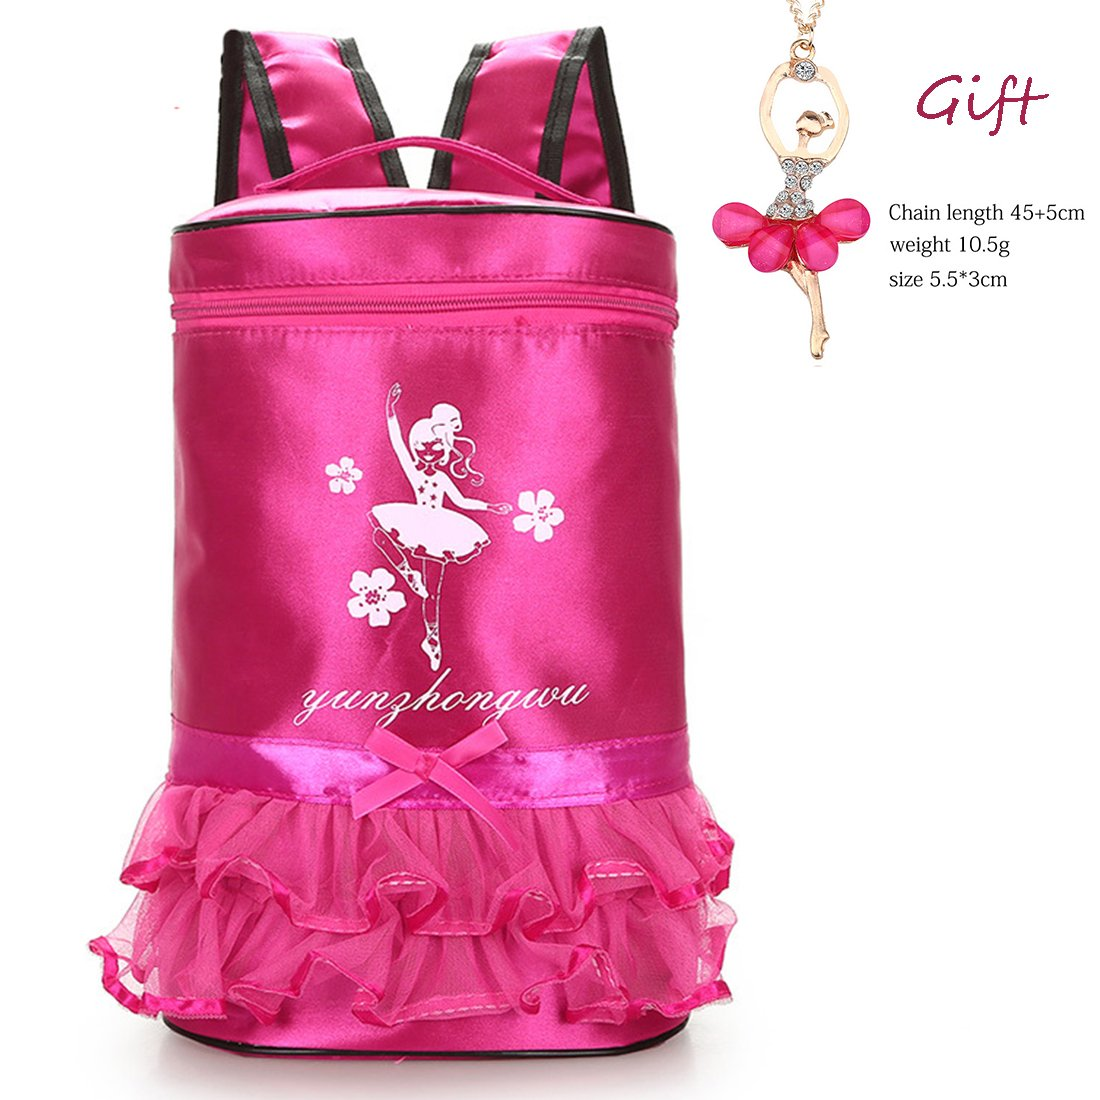 Debbieicy Cute Ballet Dance Bag Tutu Barbie Dress Bag + Ballerina Necklace for Girls (Rose3)